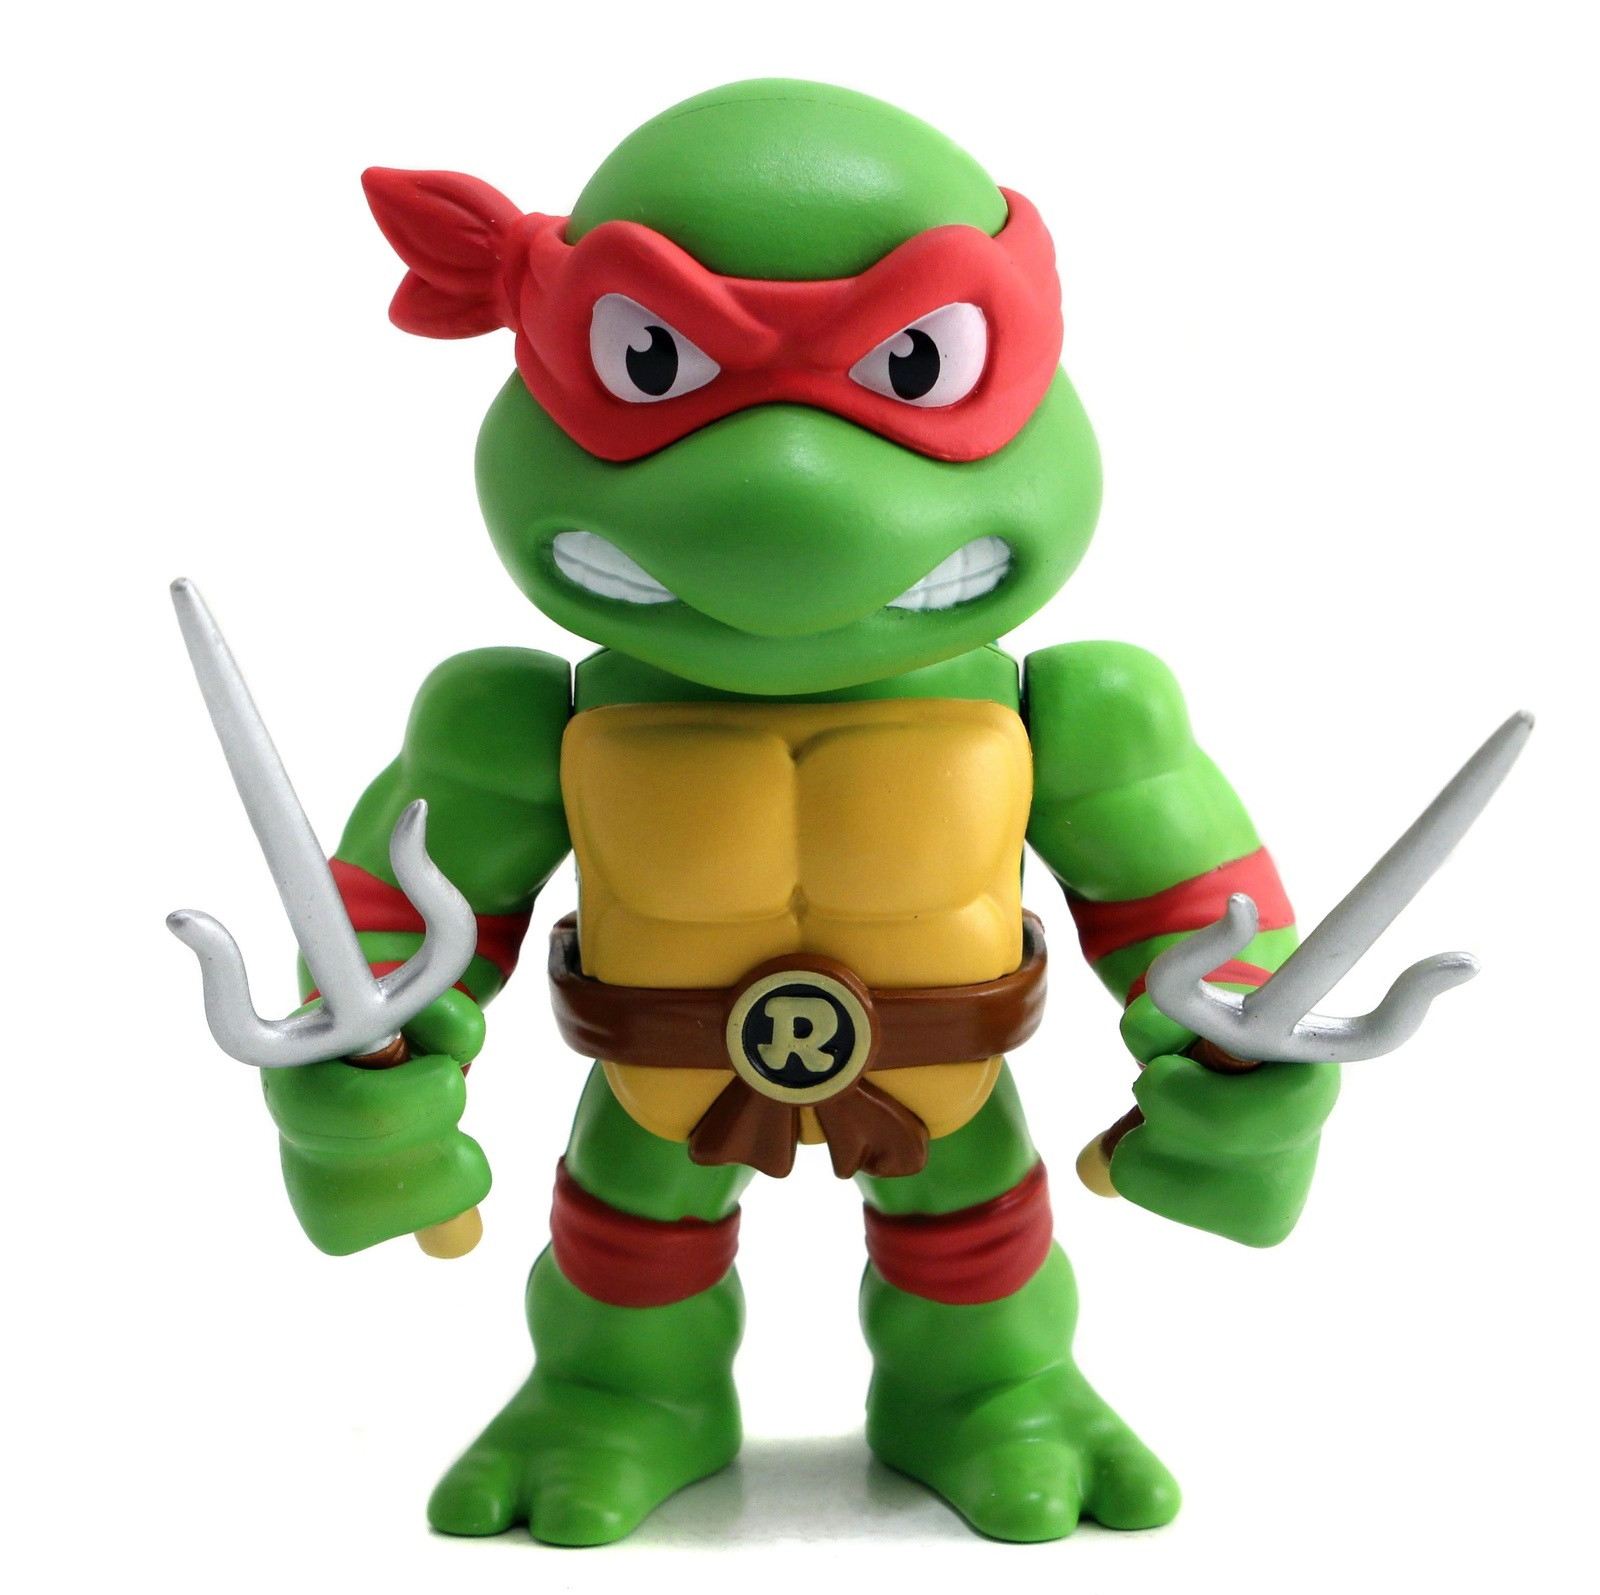 Jada Metals: Raphael - Die-Cast Figure image